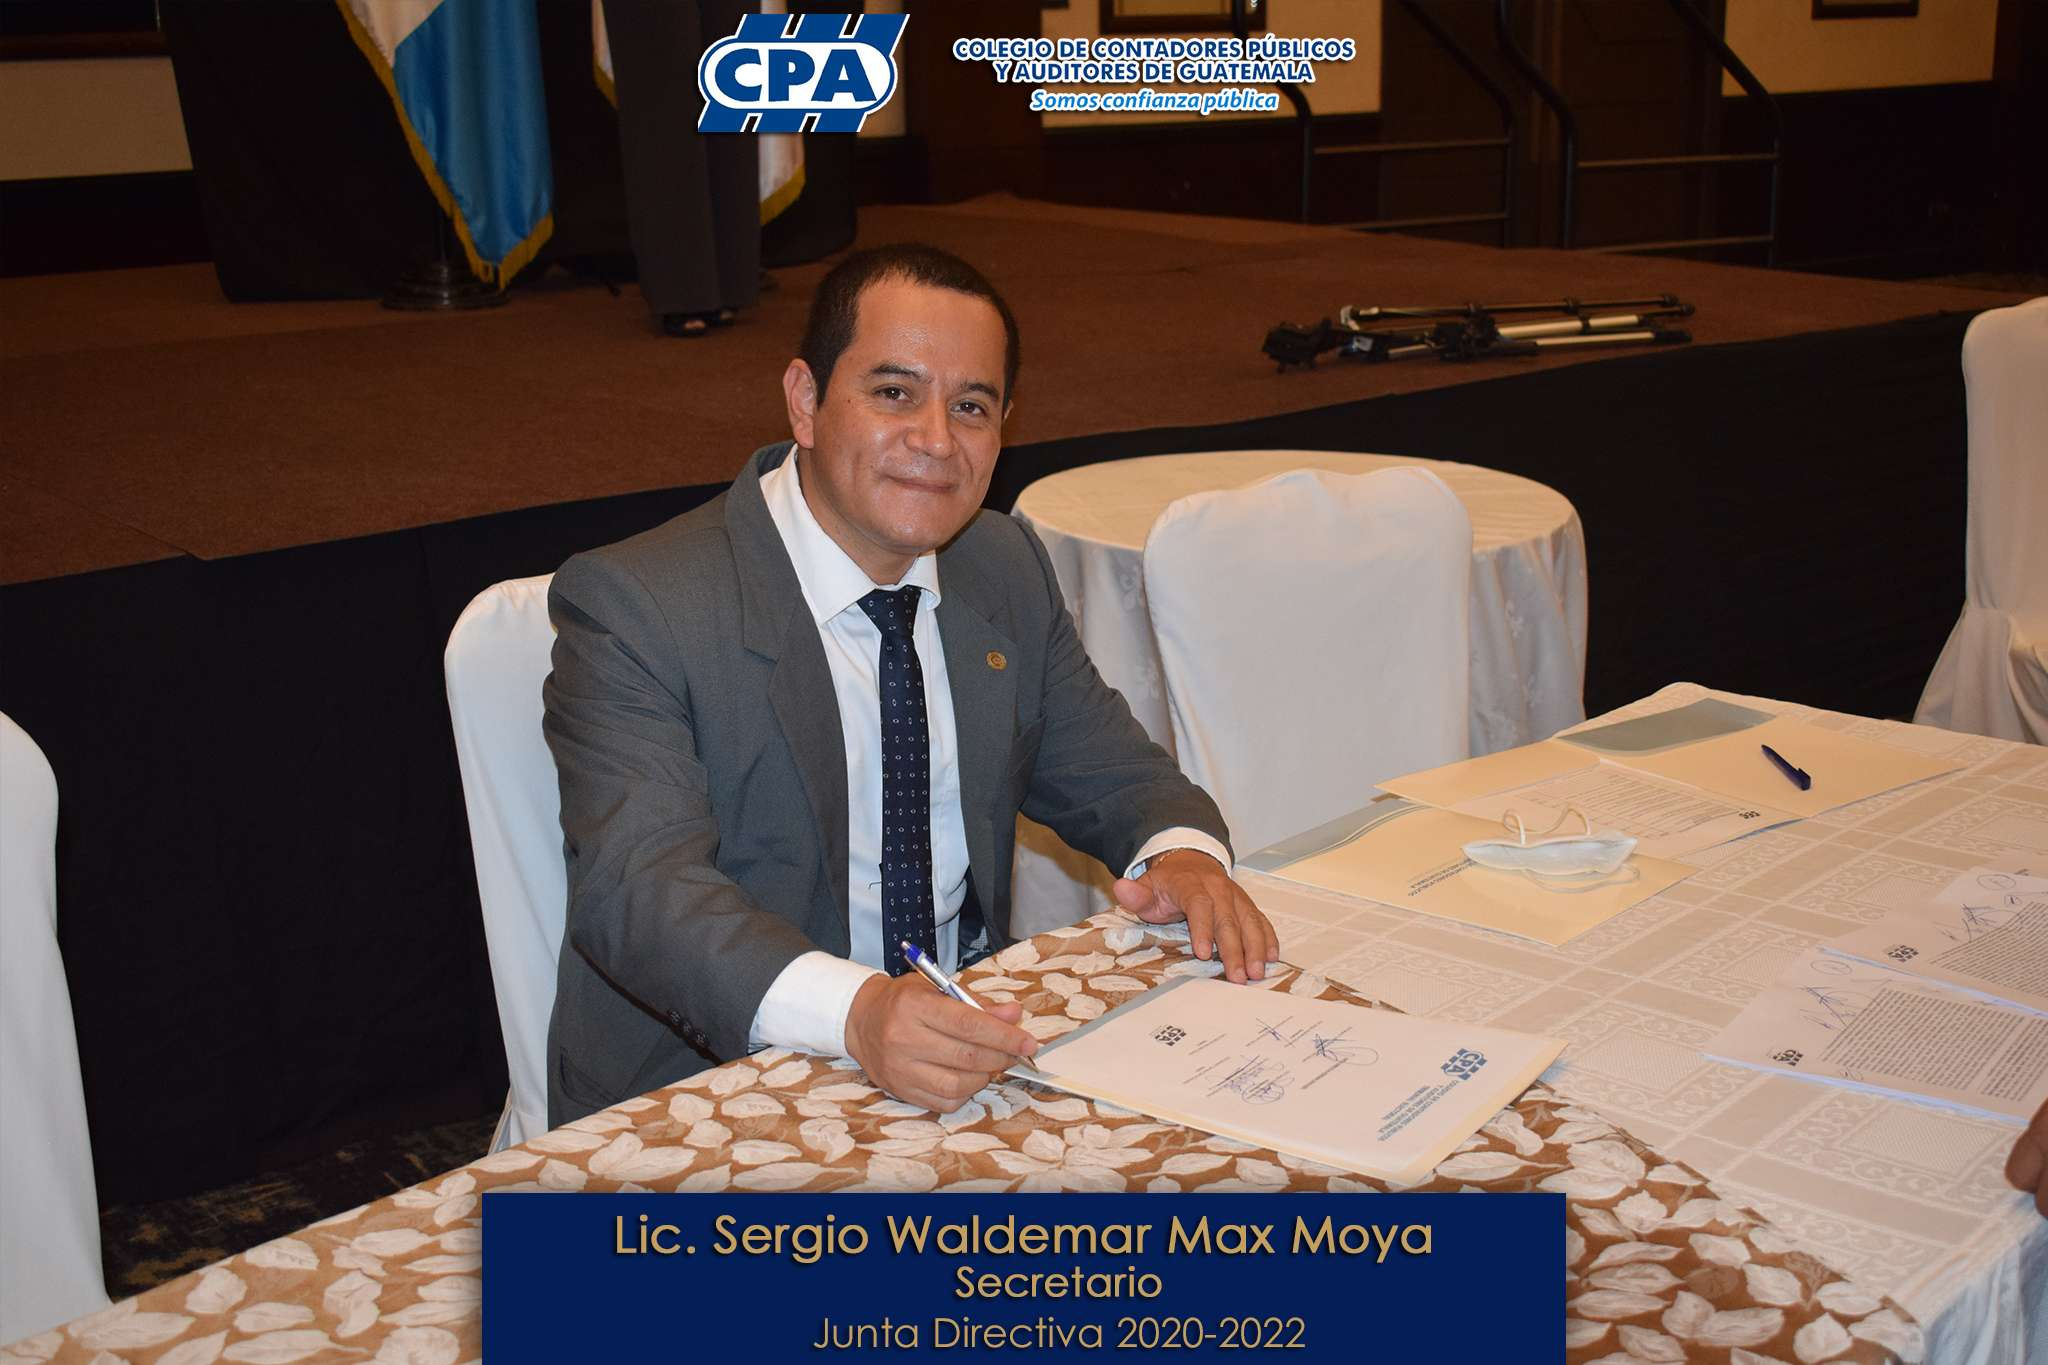 Lic Sergio Waldemar Max Moya